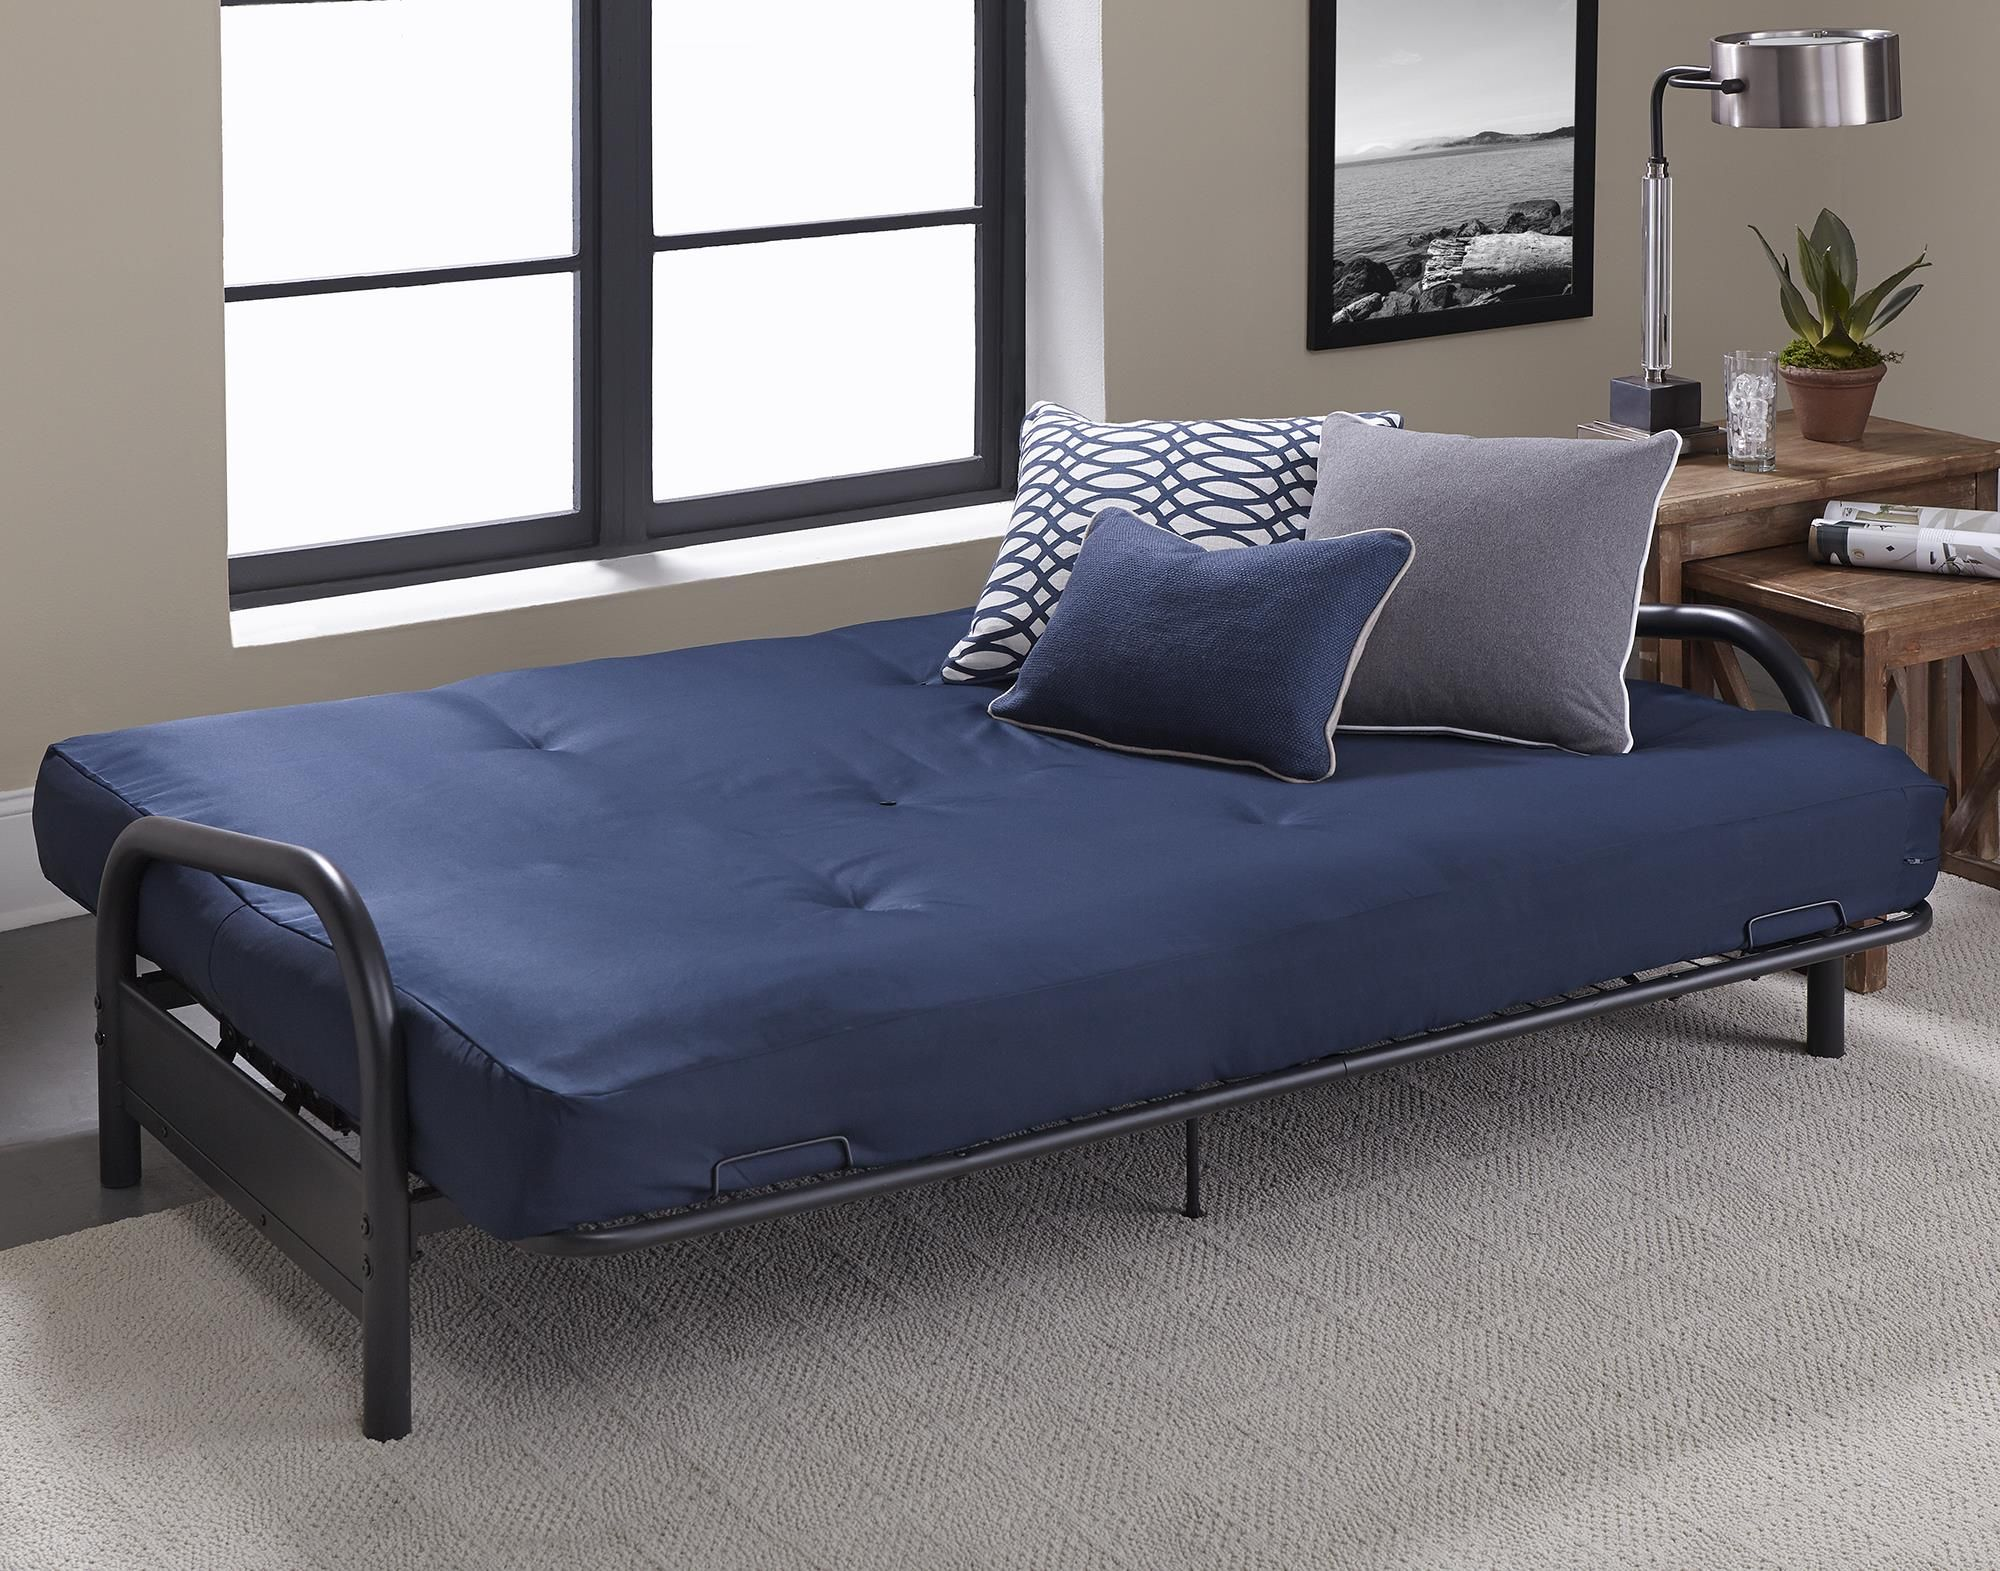 Shop for durable futon mattresses Best futon, Best futon